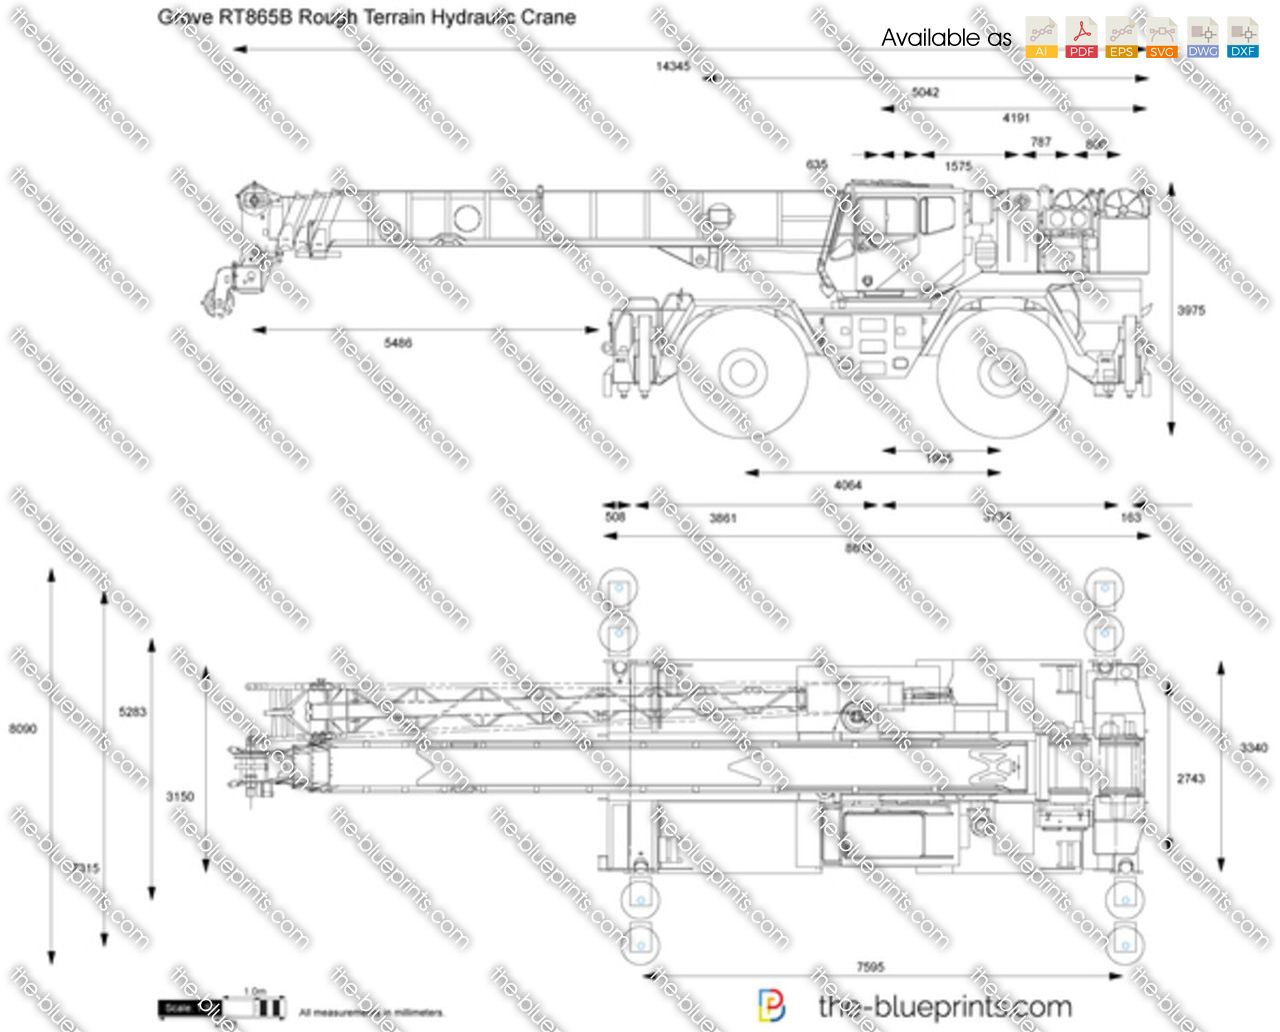 Grove RT865B Rough Terrain Hydraulic Crane